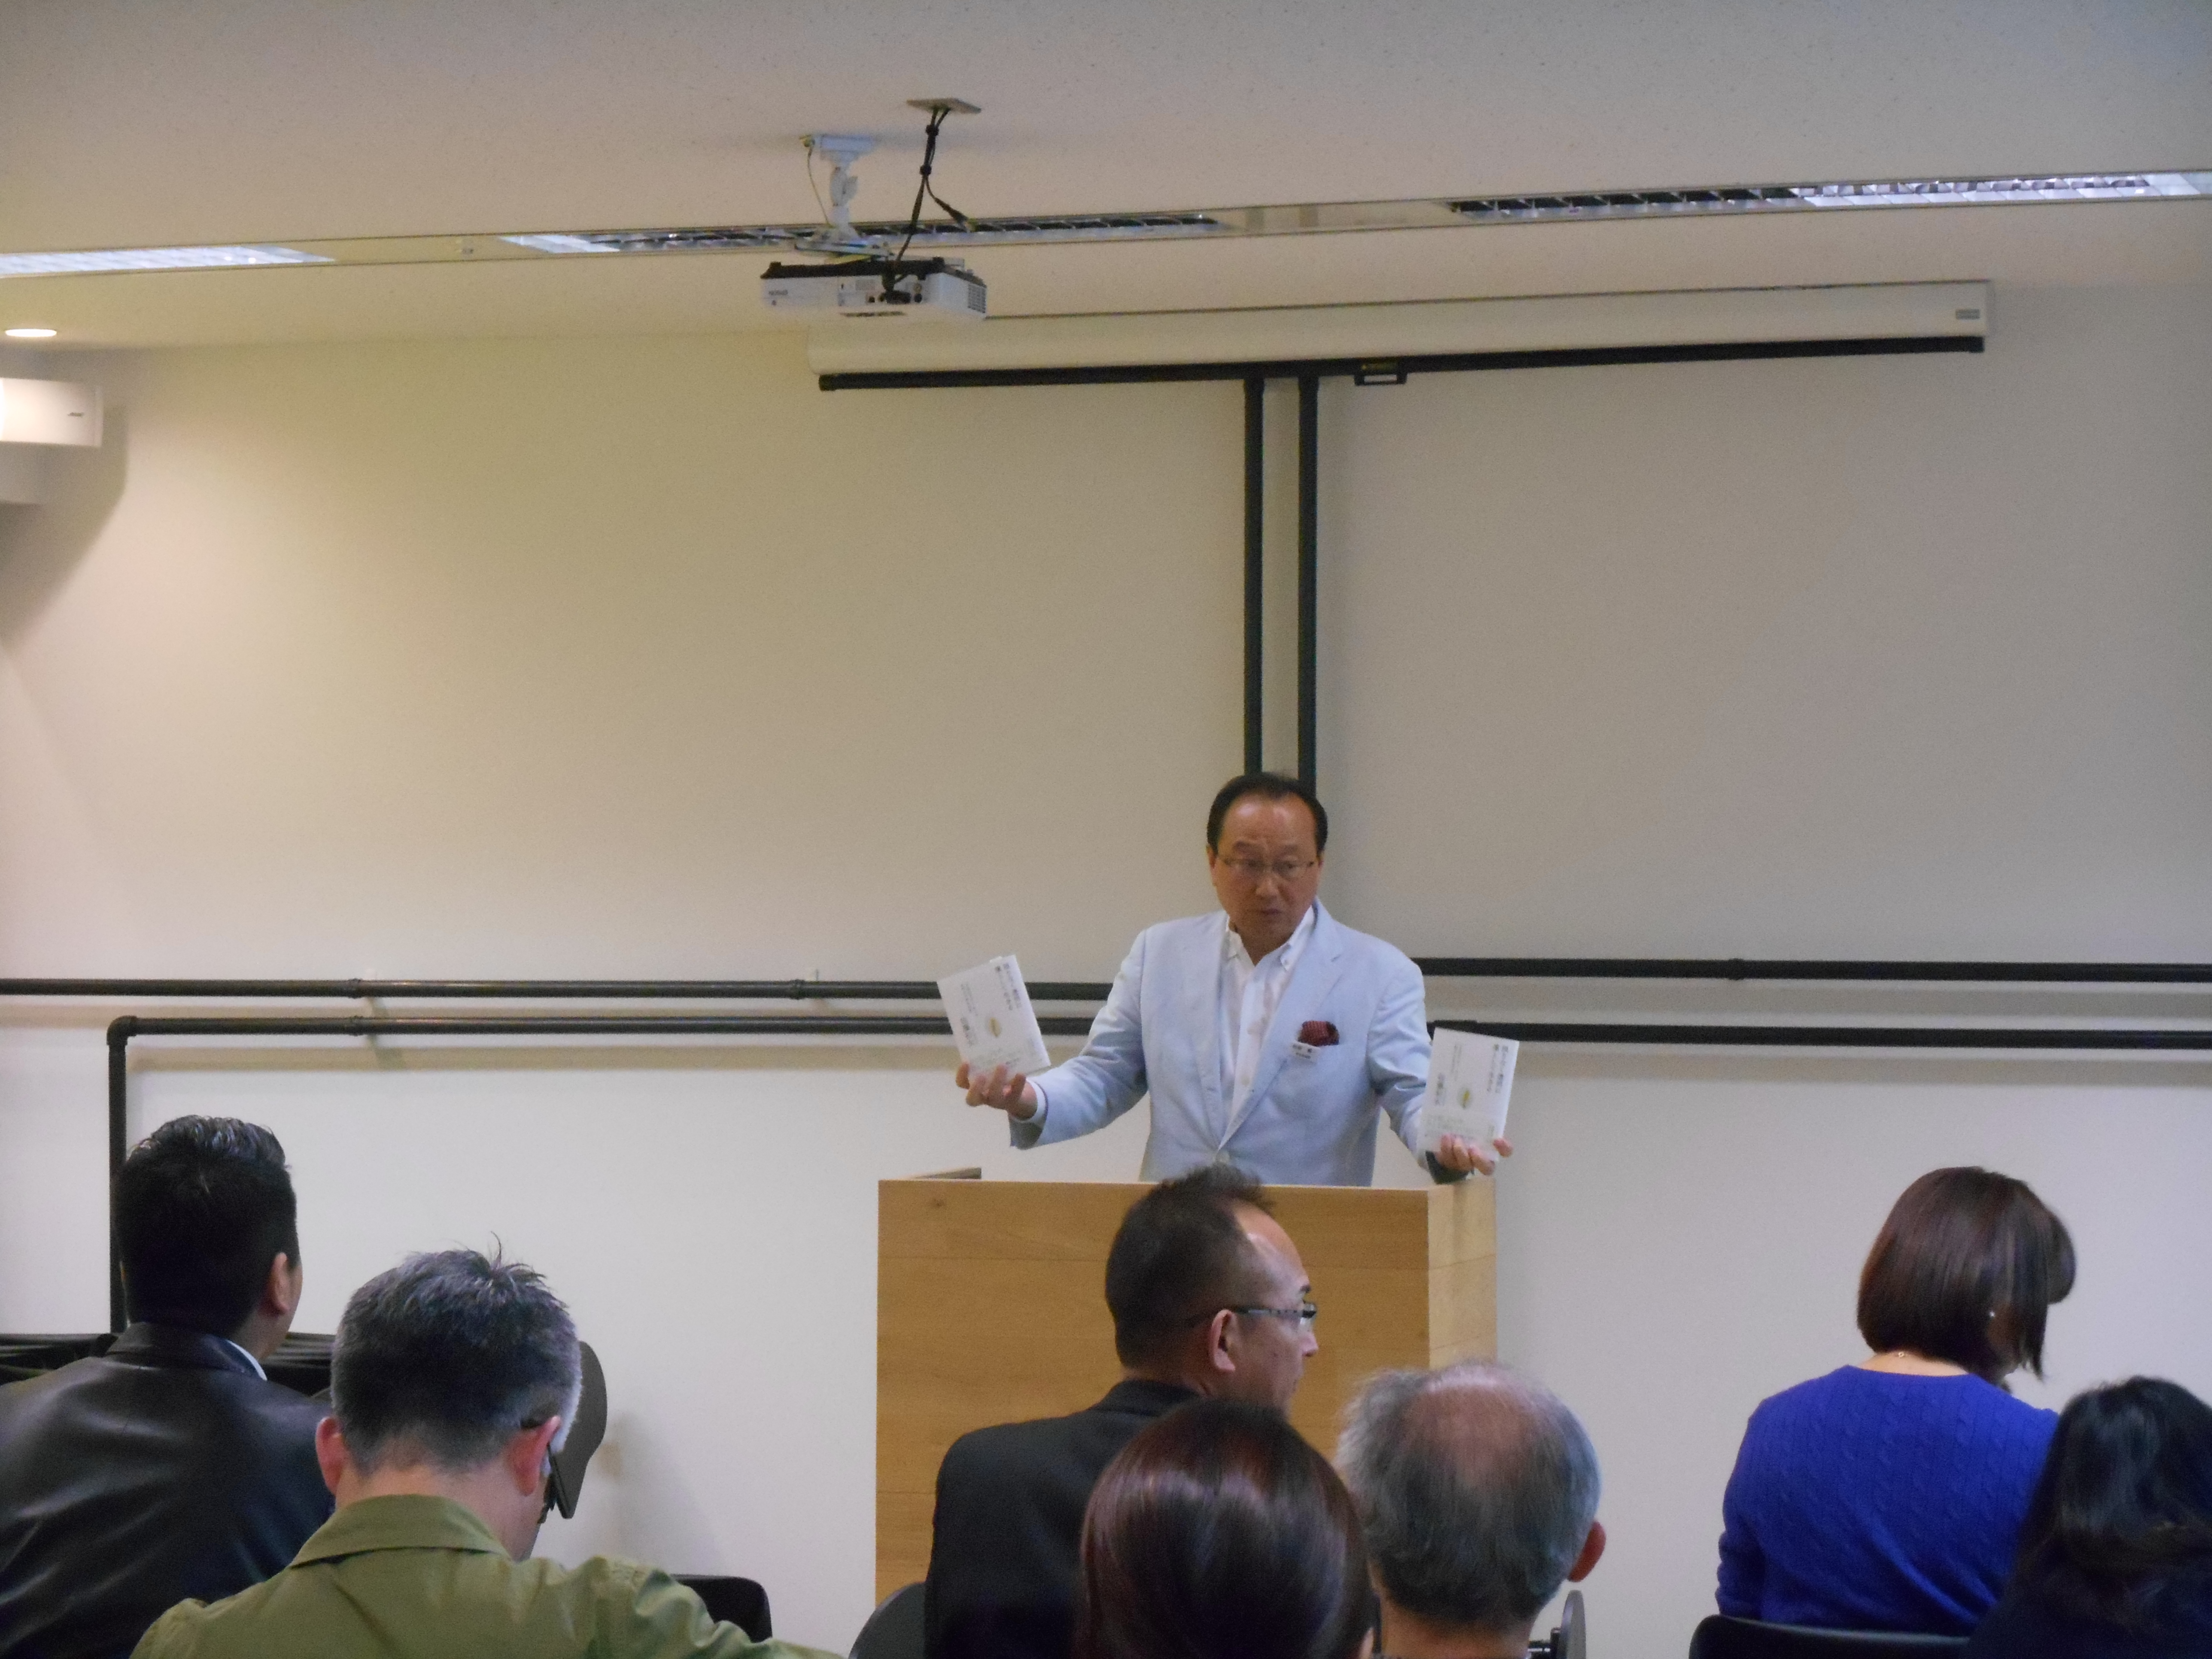 DSCN3708 - 2017年2月4日東京思風塾開催